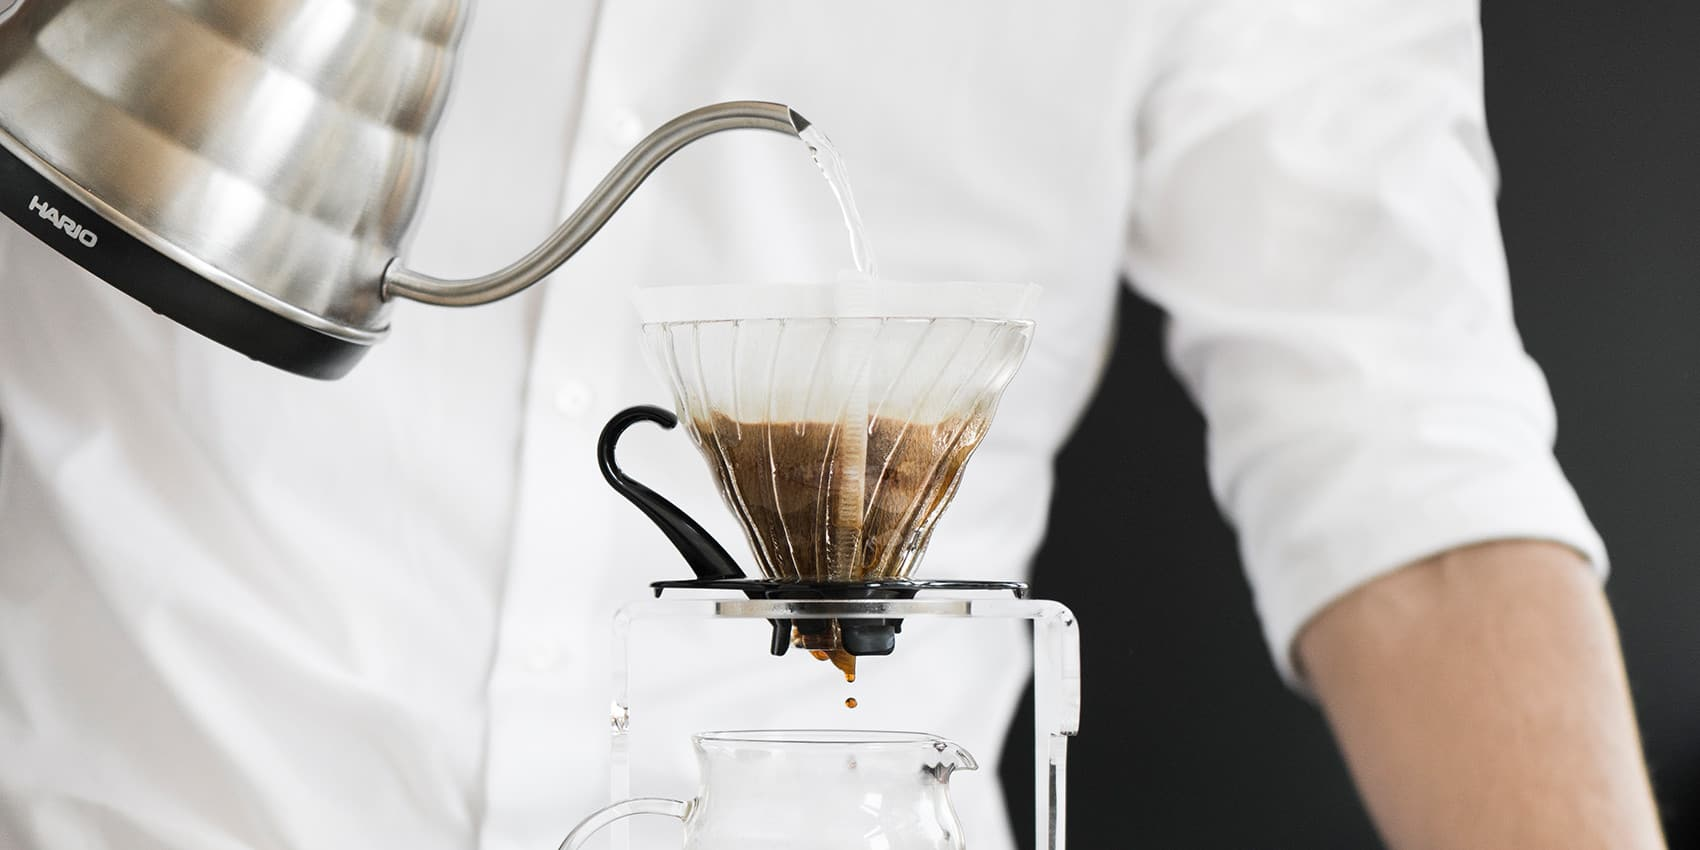 Kaffee aufgießen